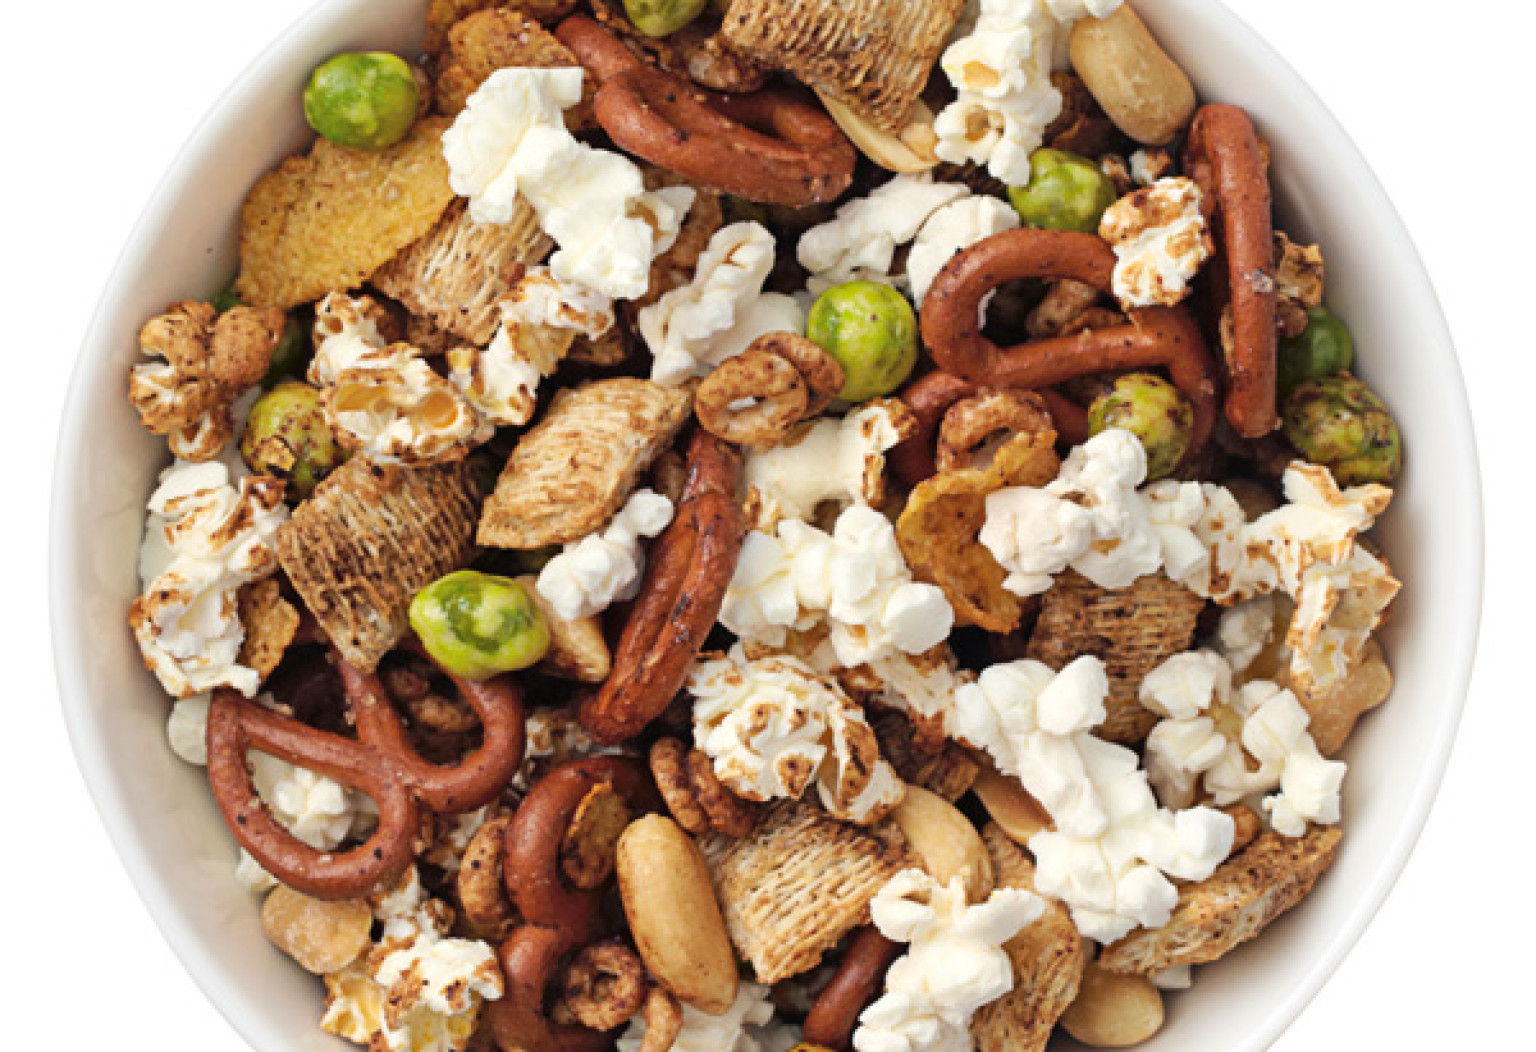 Homemade Healthy Snacks  Healthy Homemade Snacks Minus the Guilt